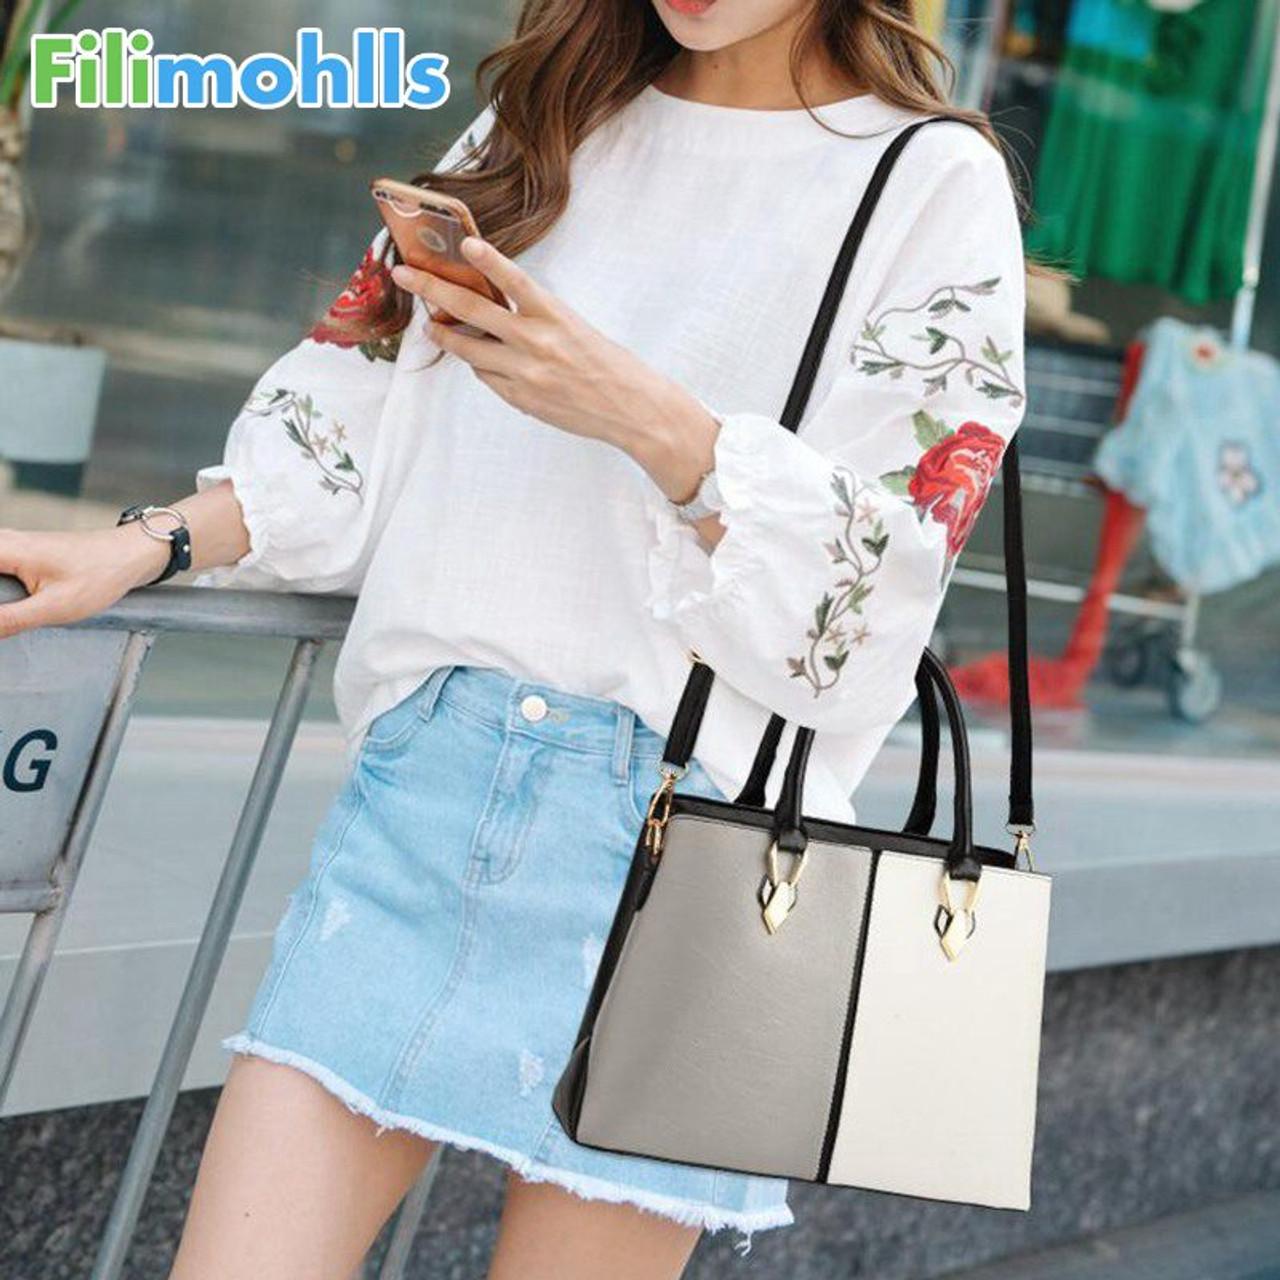 0450e3cc6fa Luxury Handbags Women Bags Designer Leather Bags For Women 2018 Fashion  Ladies Handbag New Arrivals Shoulder Hand Bag S1509